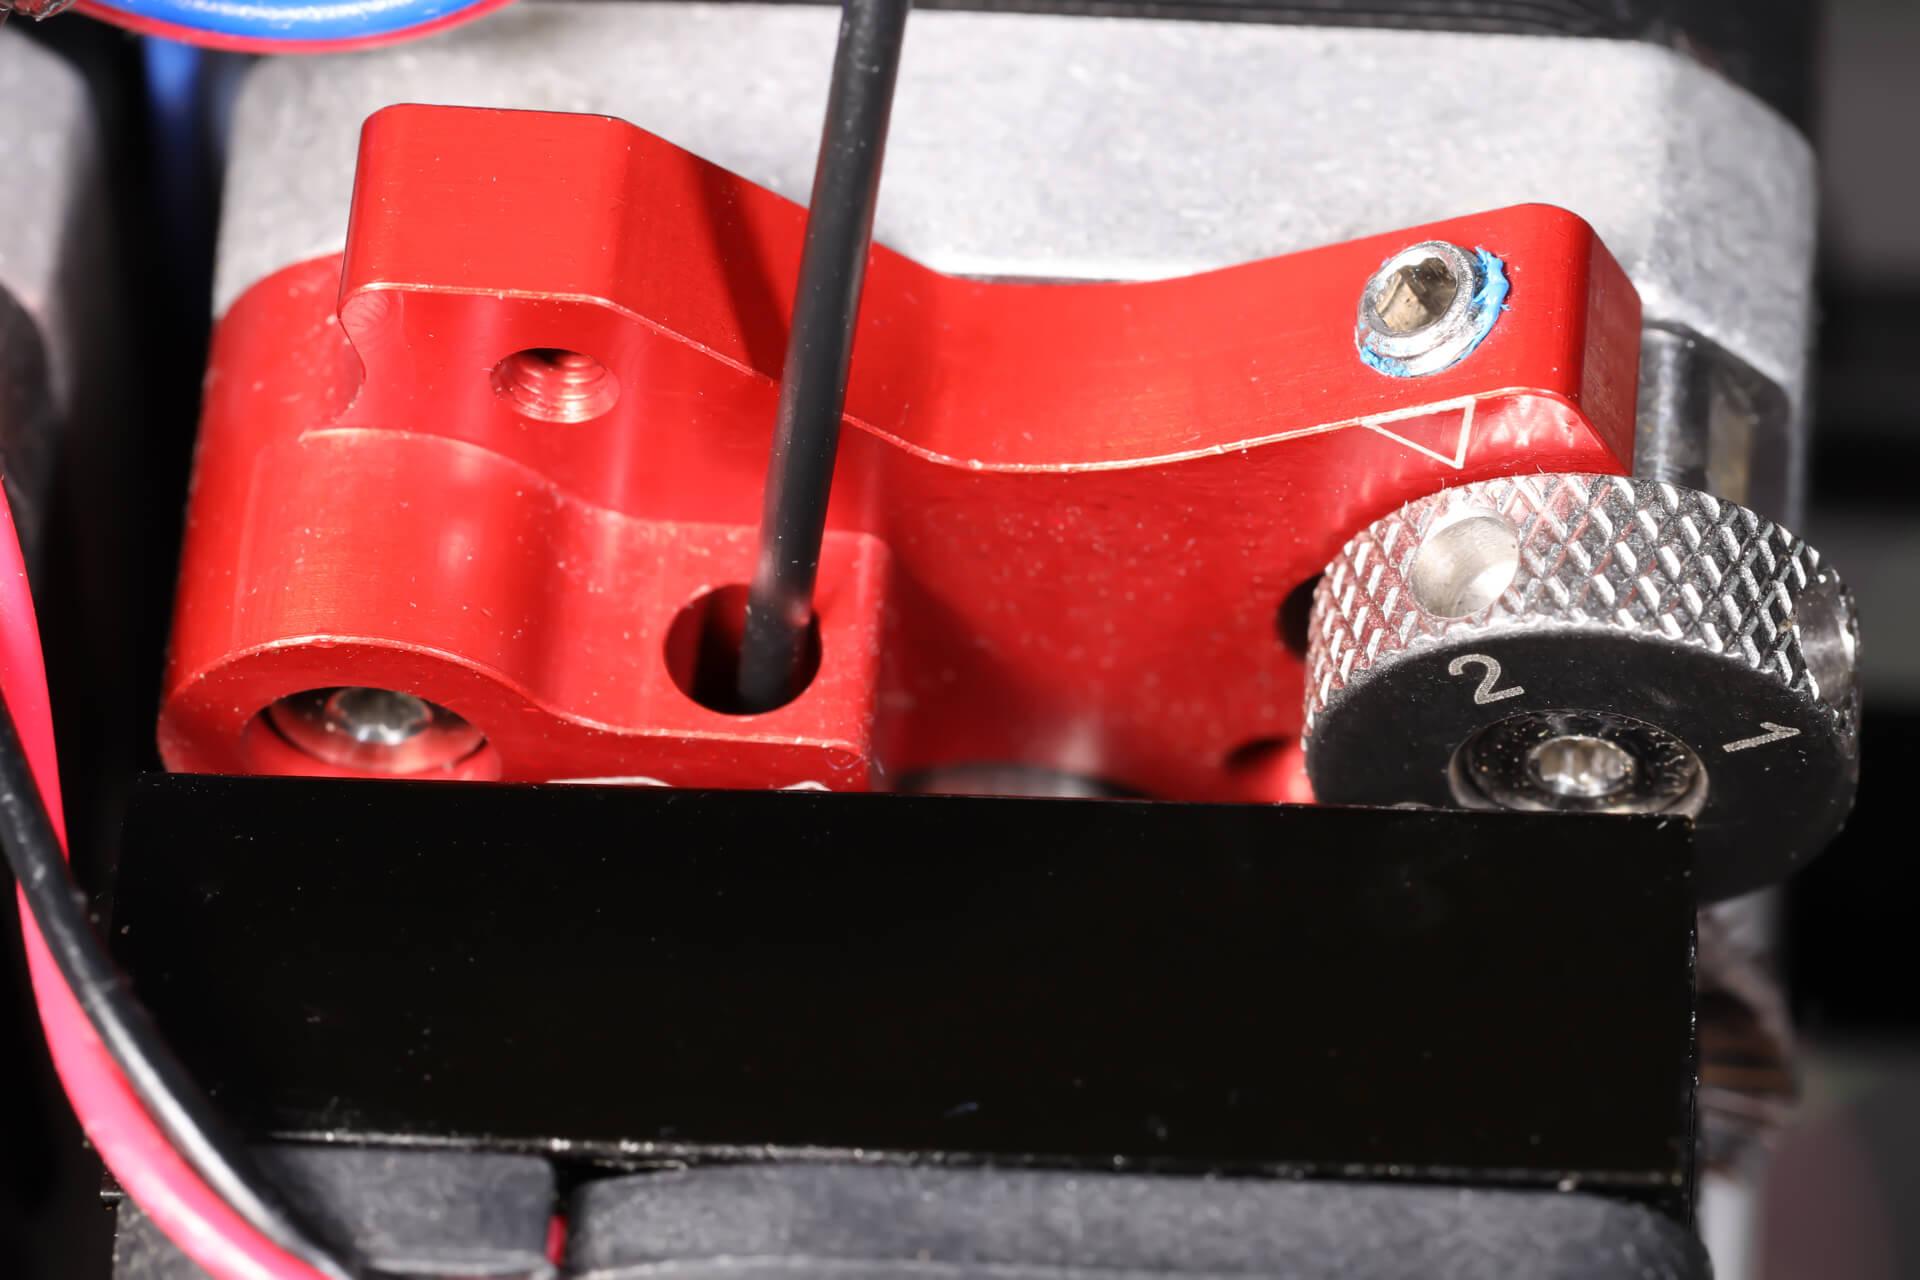 Flexible TPU Filament for 3D Printing - Brands Settings & Examples